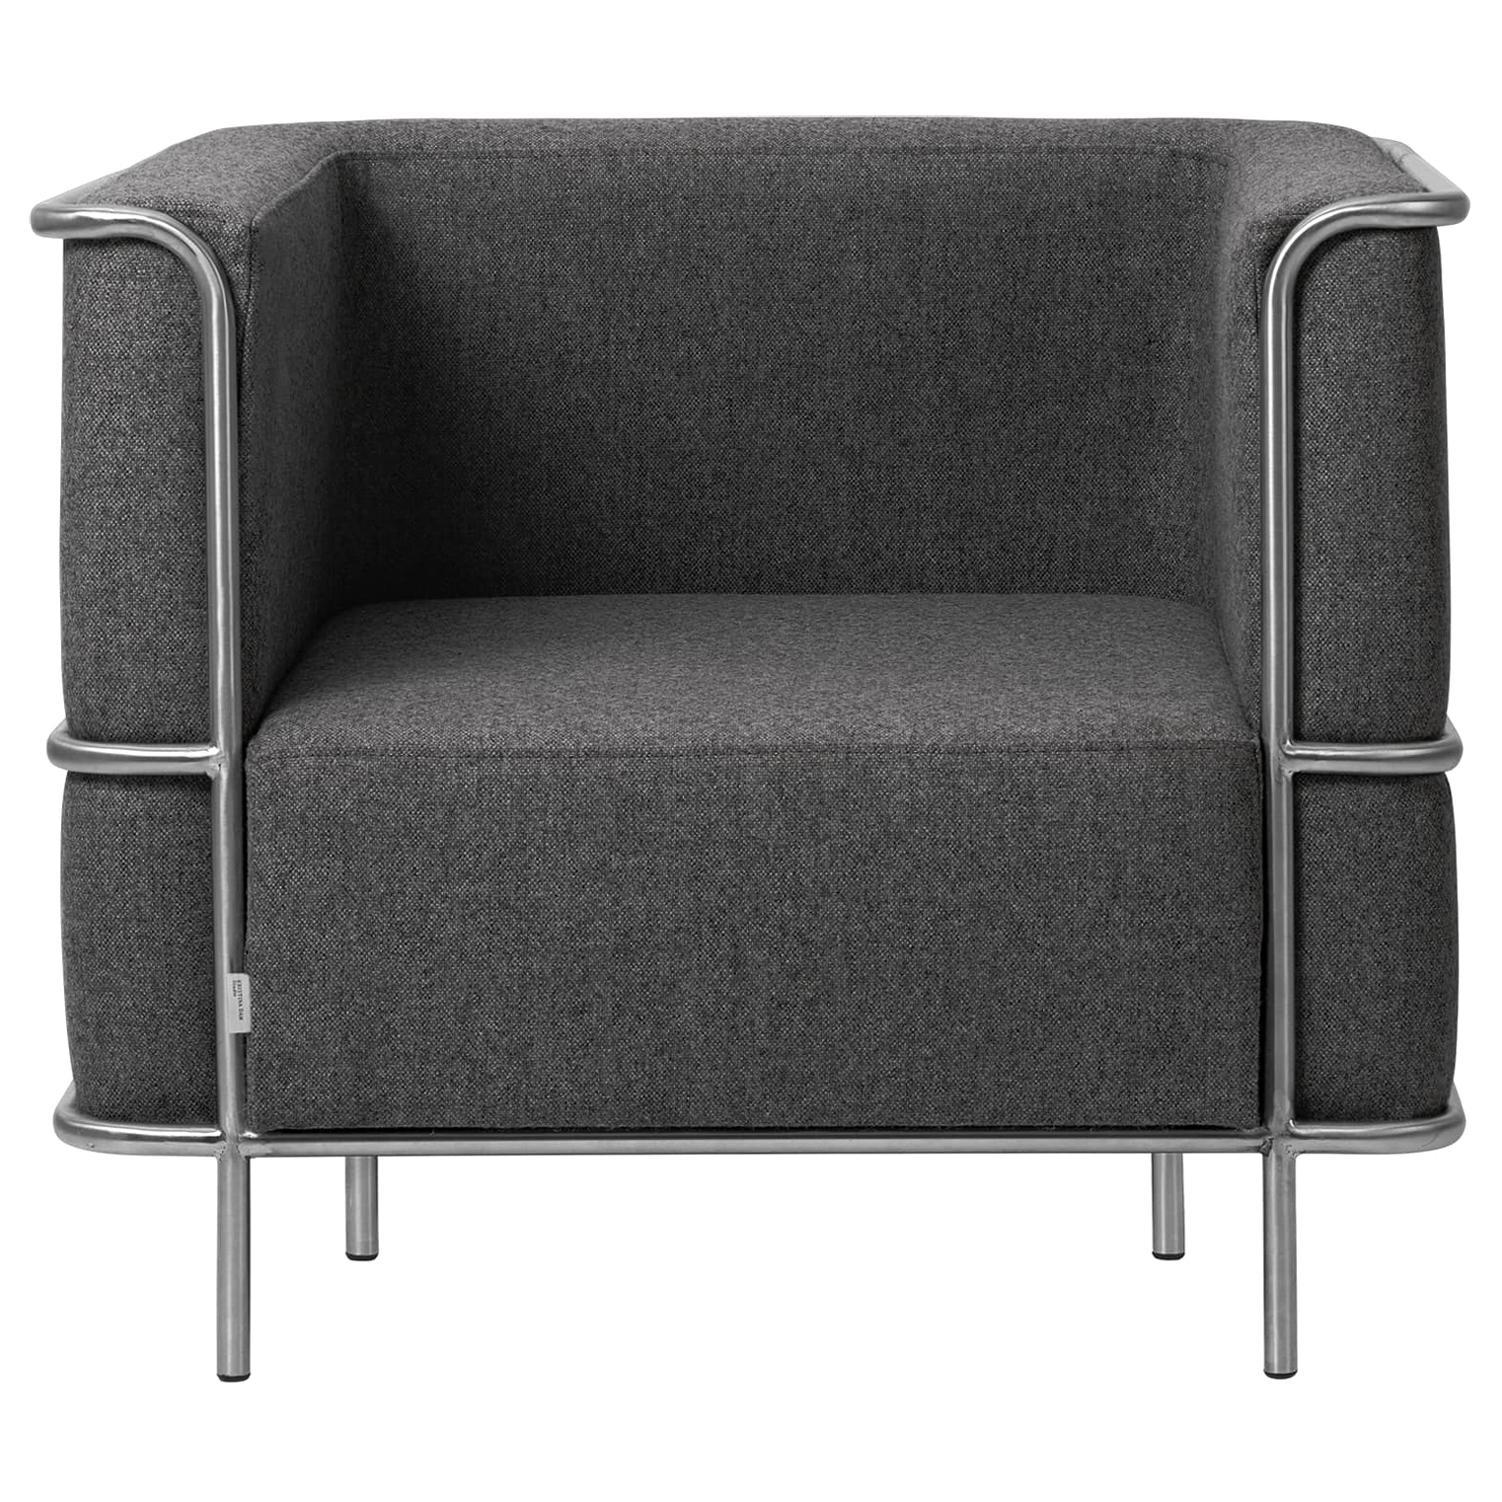 Grey Modernist Lounge Chair by Kristina Dam Studio